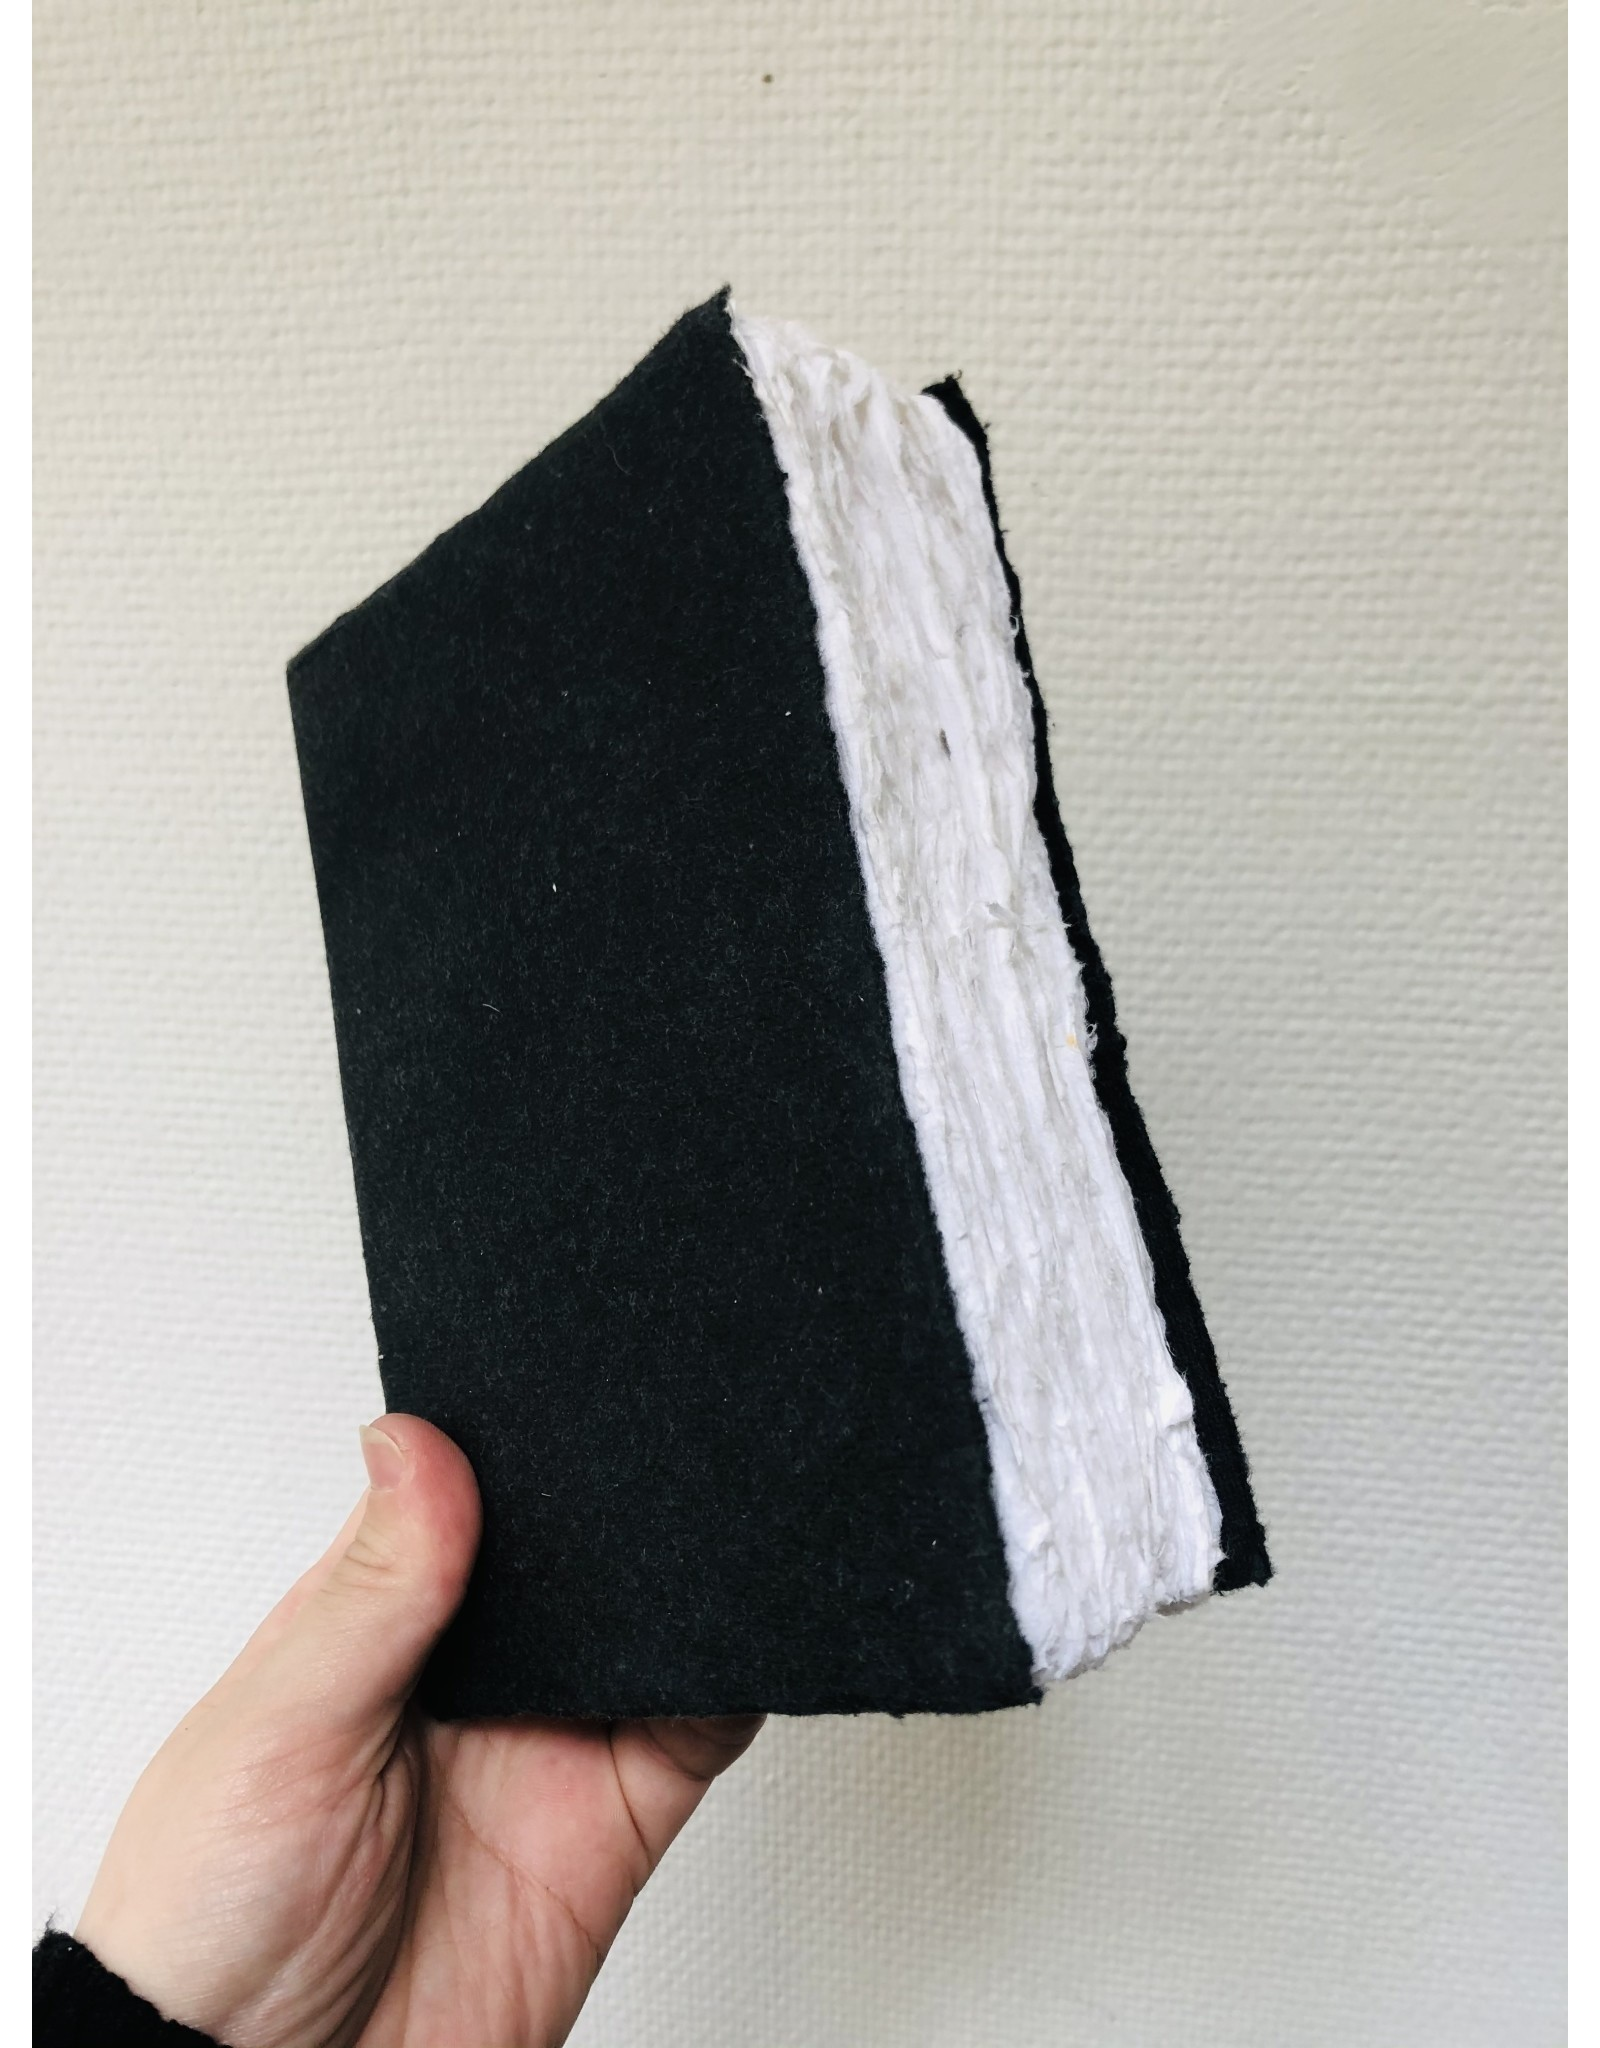 Lamali Boek Laisse - Zwart - Zachte papieren kaft  - Gestikte binding - 80 ivoren pagina's - Handgemaakt 100% katoenpapier - 12,5  x 19 cm